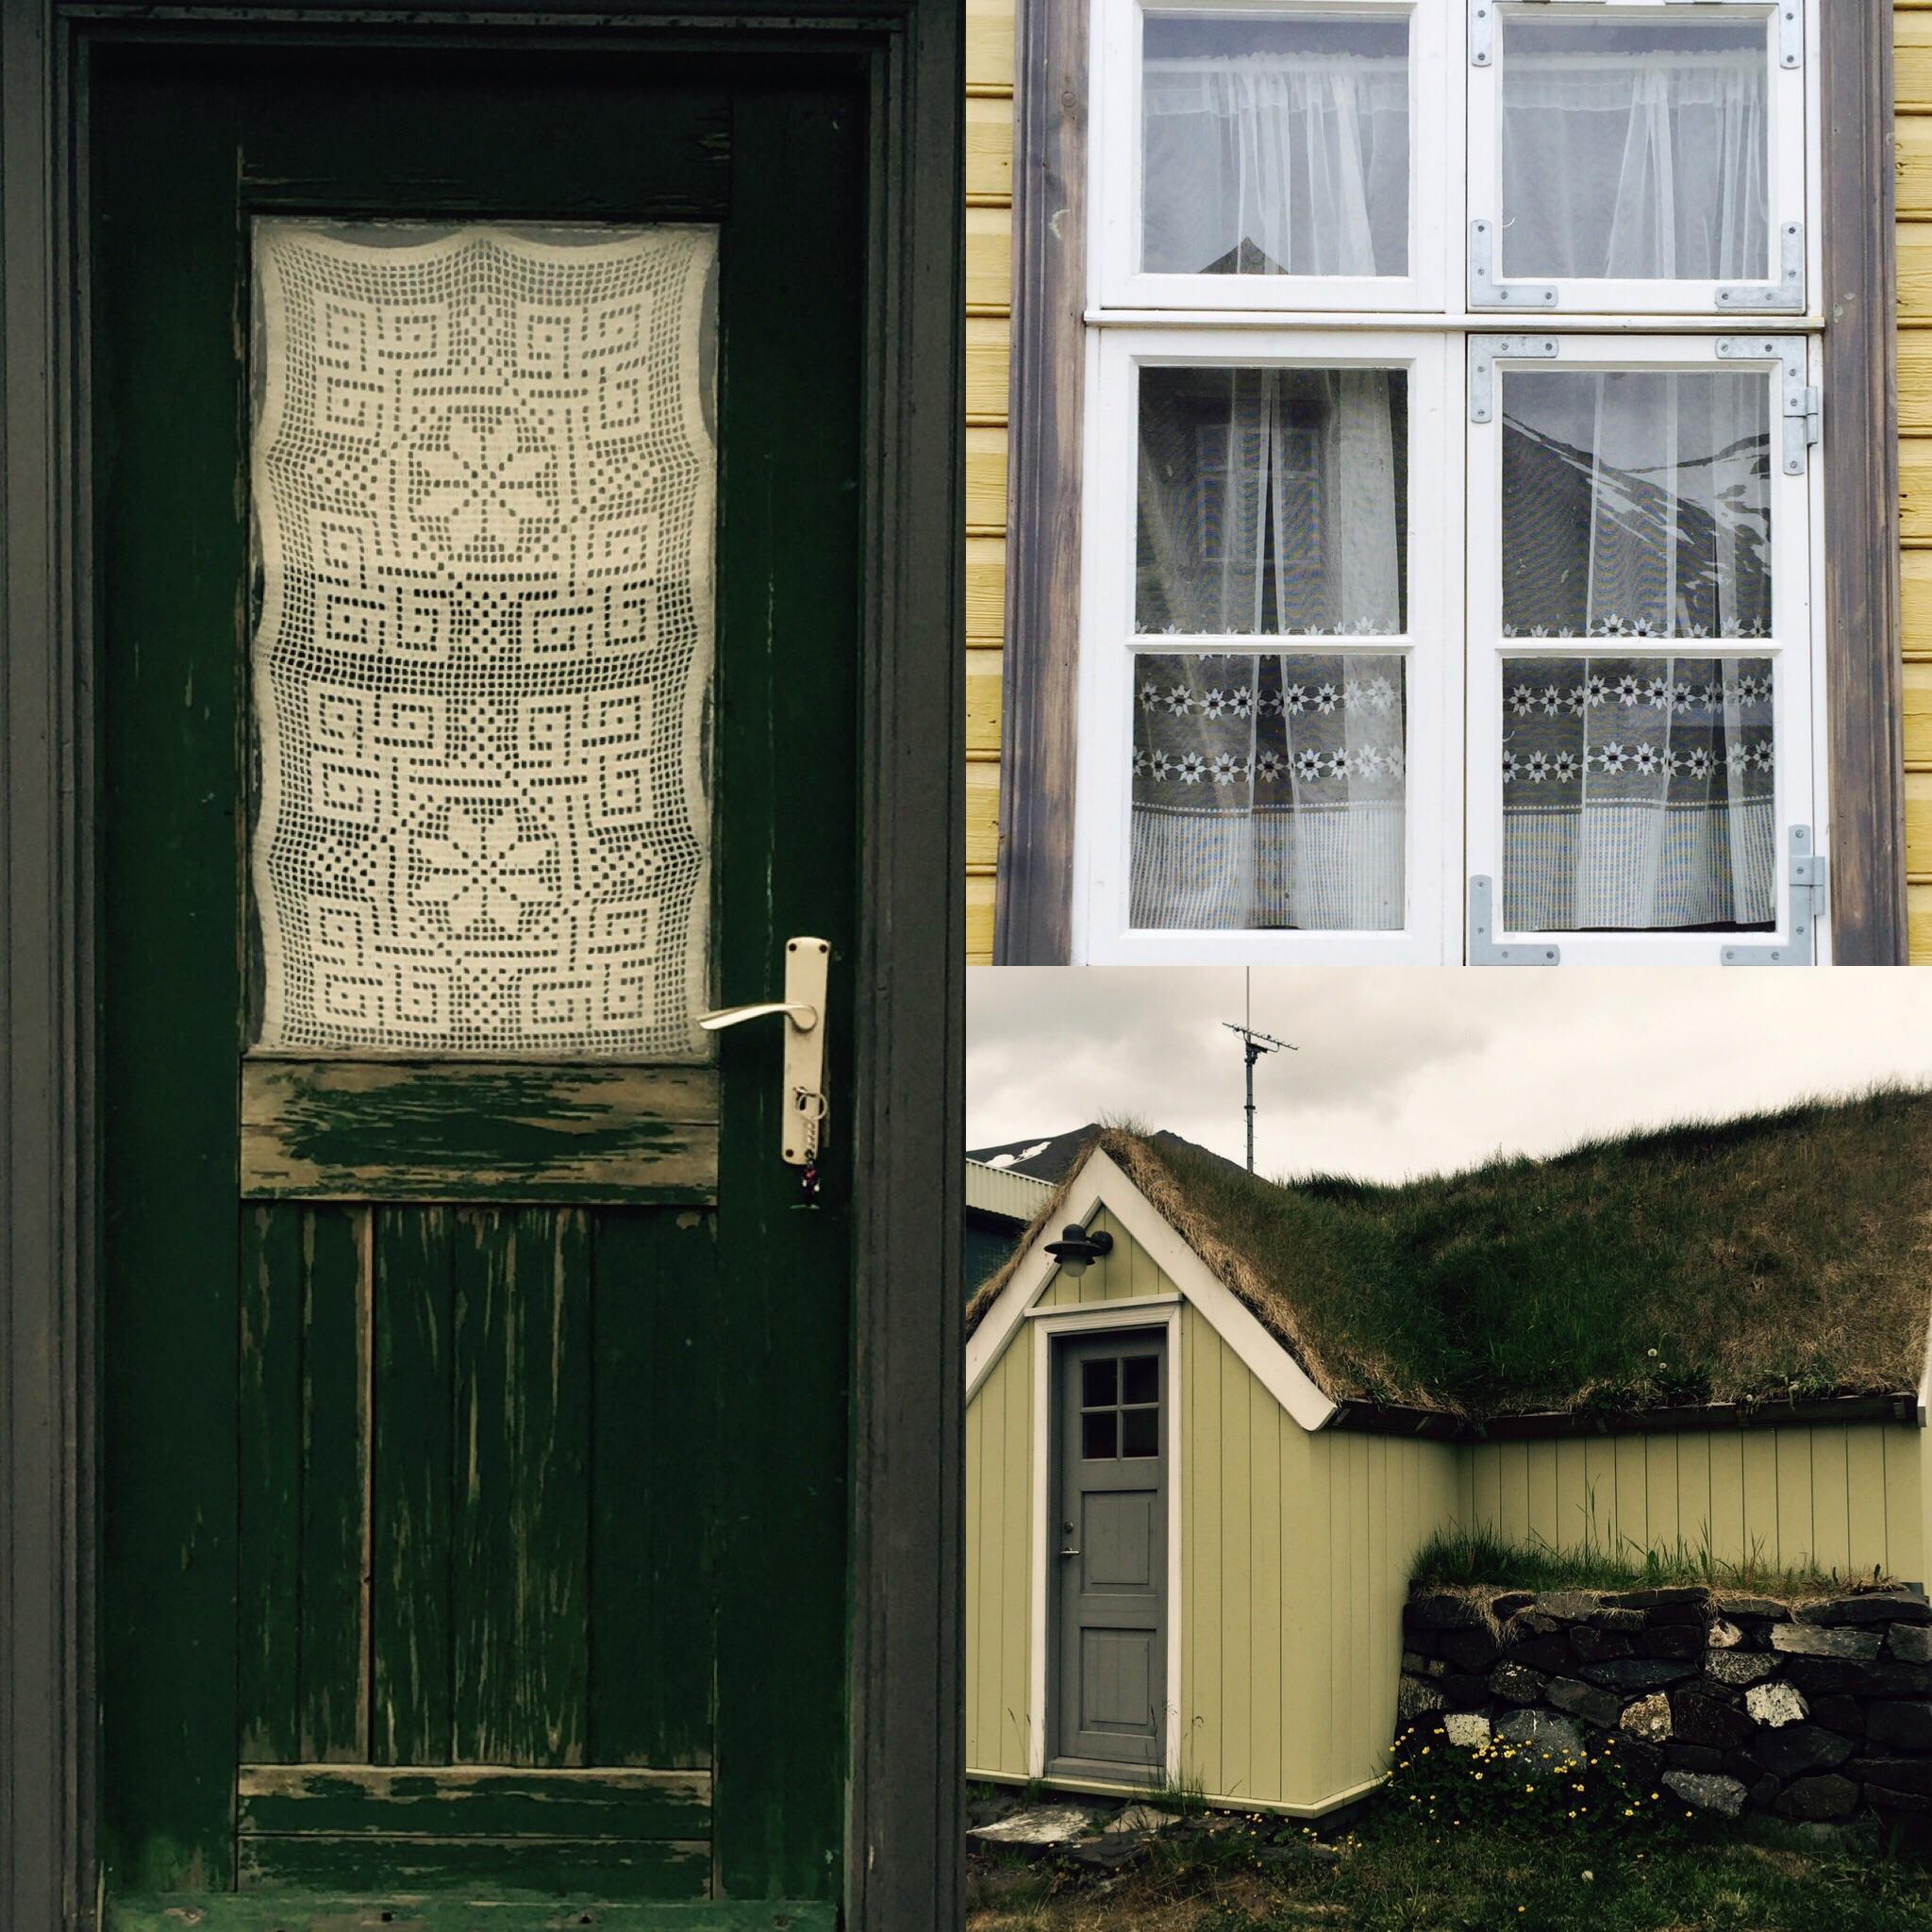 domestic details in Siglufjordur